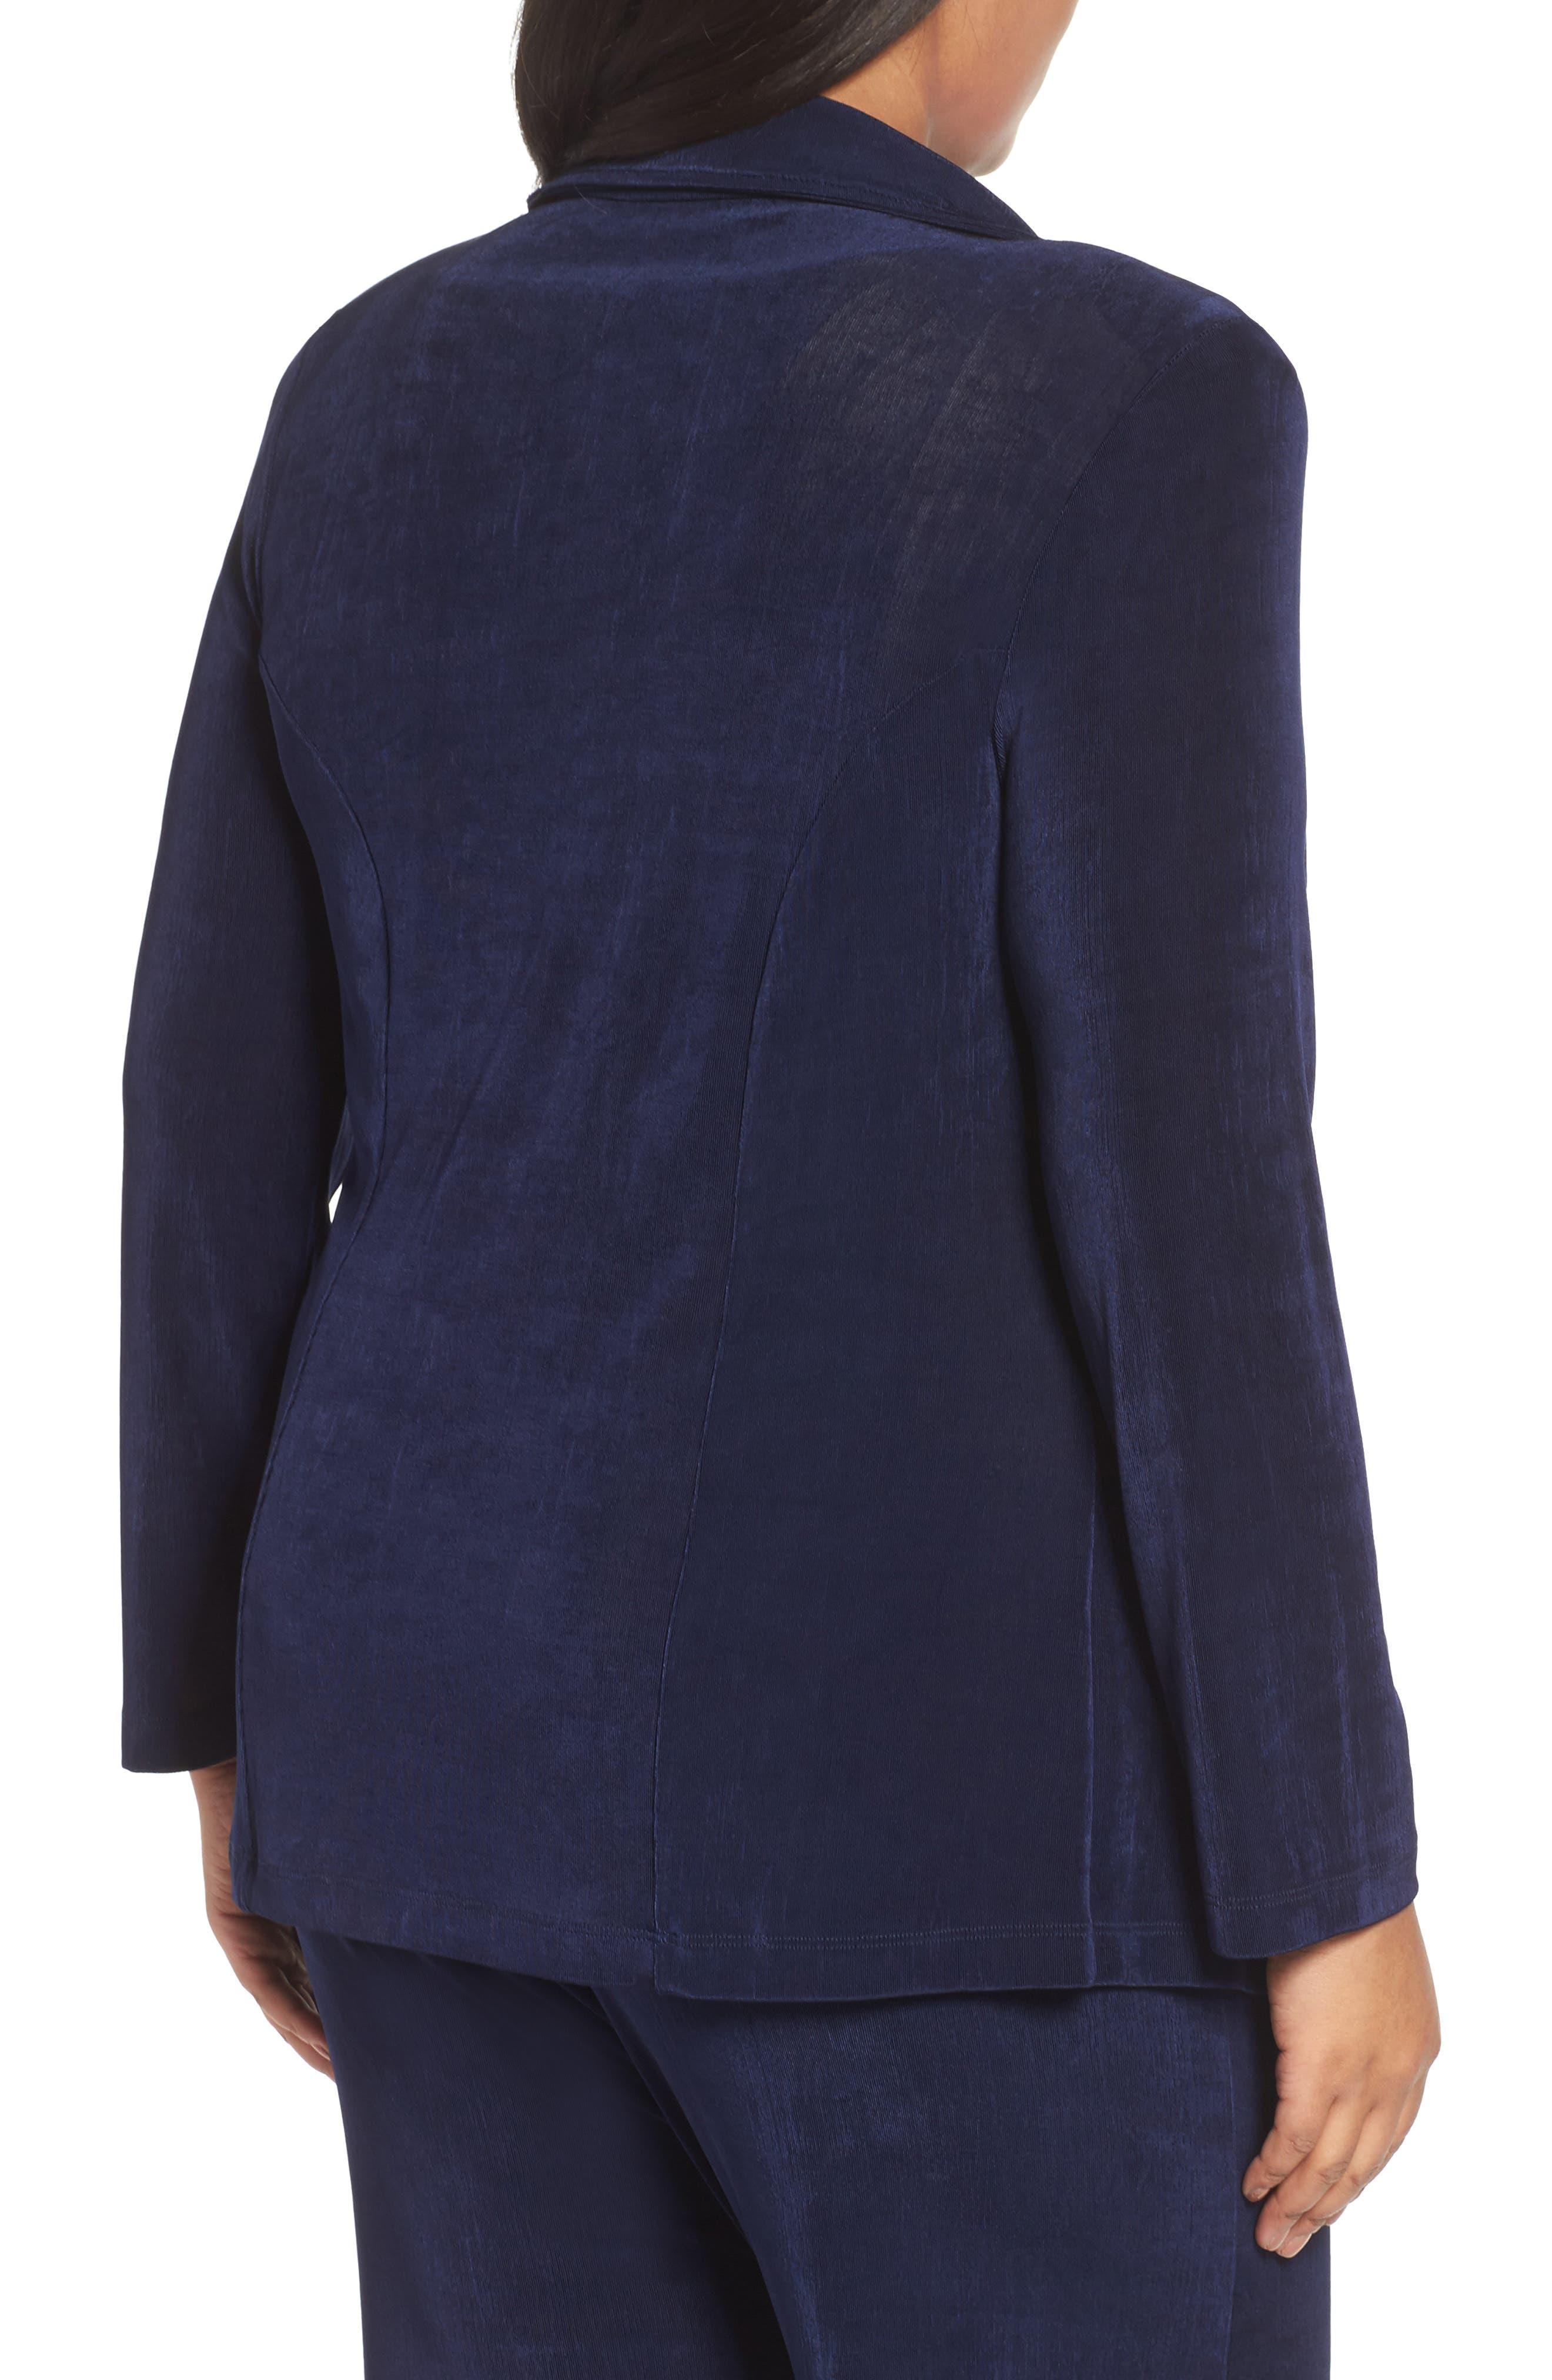 One-Button Stretch Knit Blazer,                             Alternate thumbnail 2, color,                             Navy